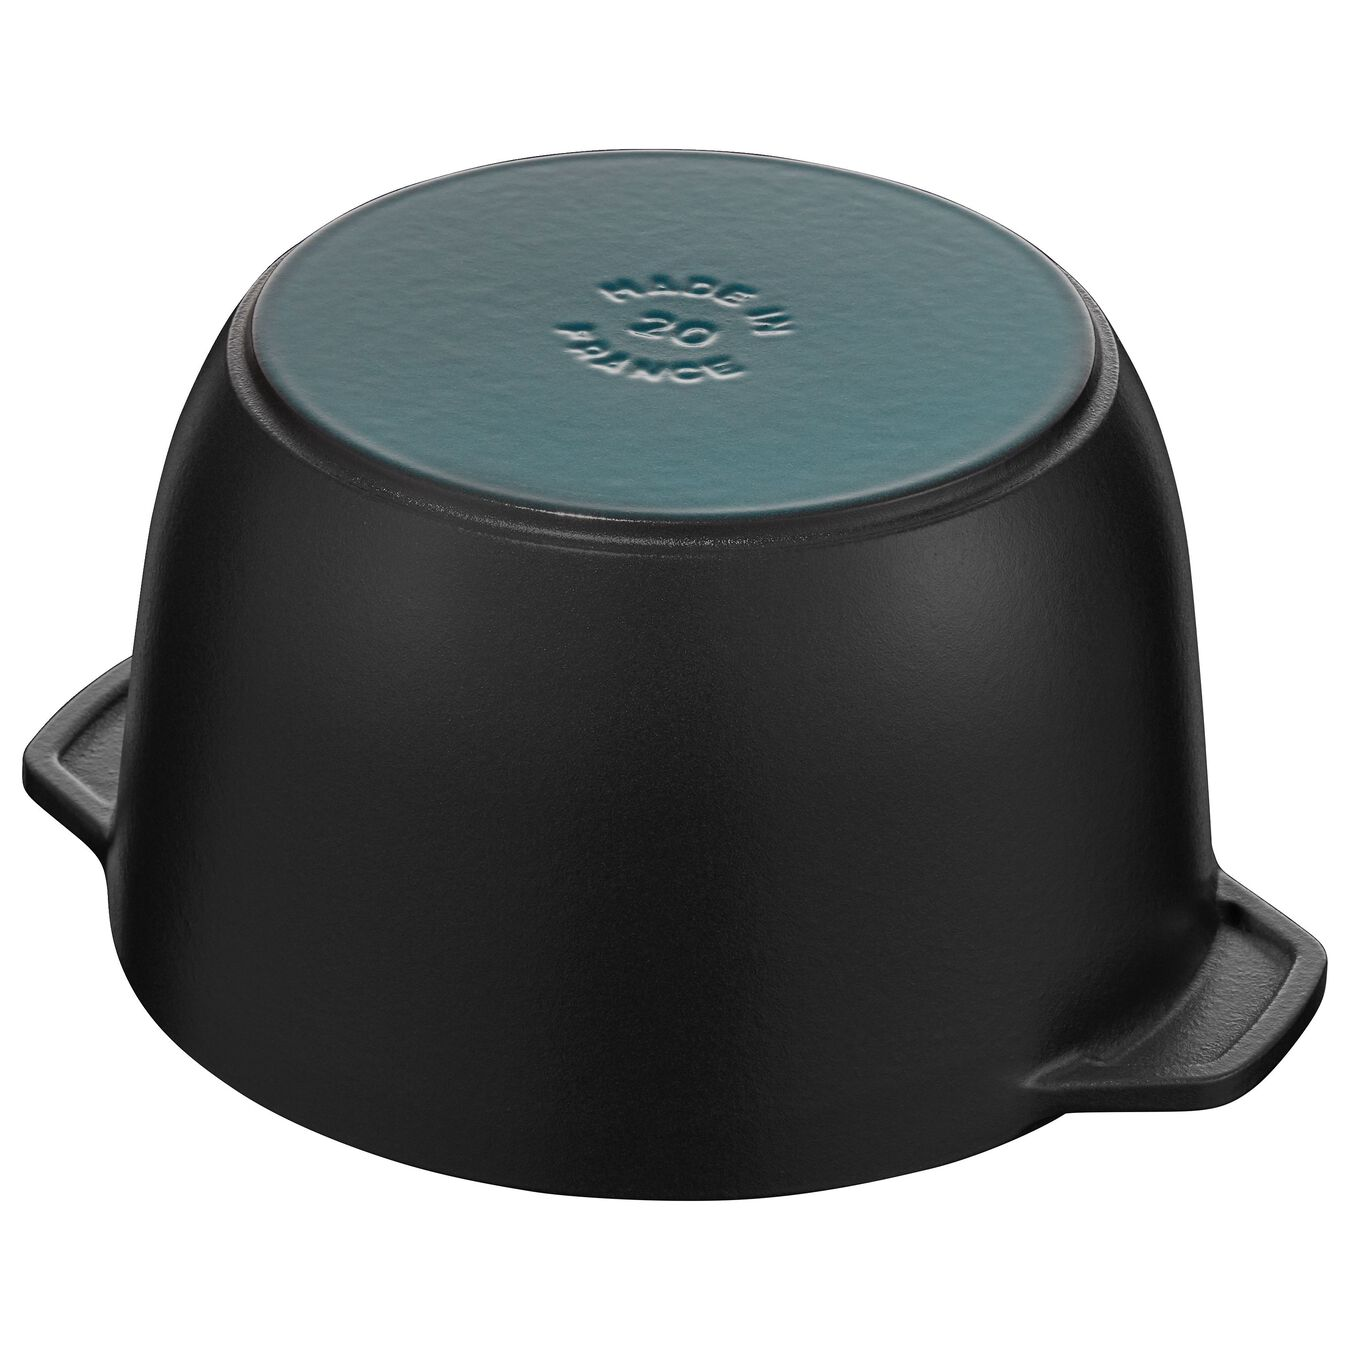 3.25-qt round Cast iron Petite French Oven, Black Matte,,large 4